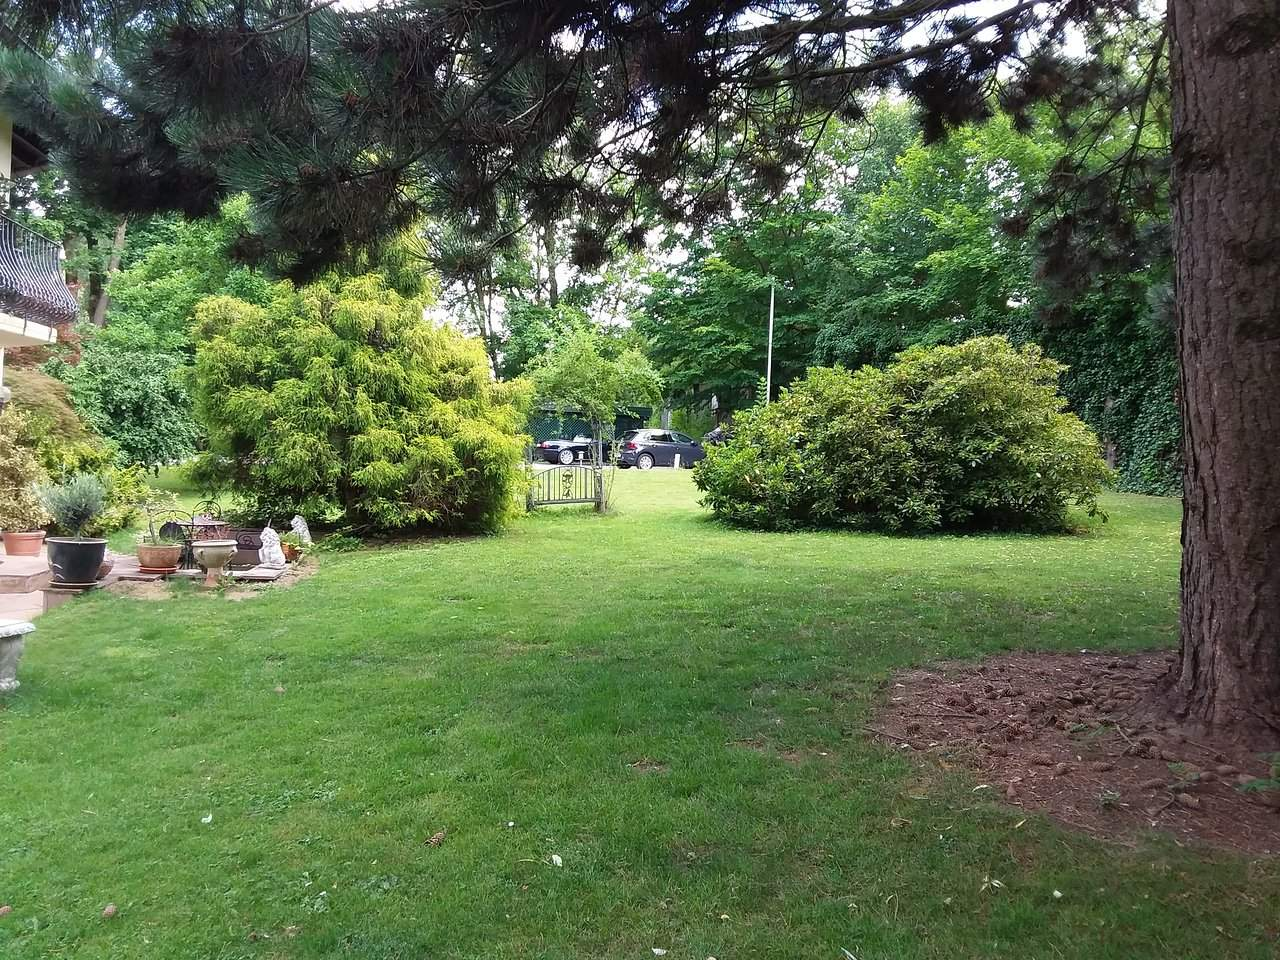 park ambiente friedberg